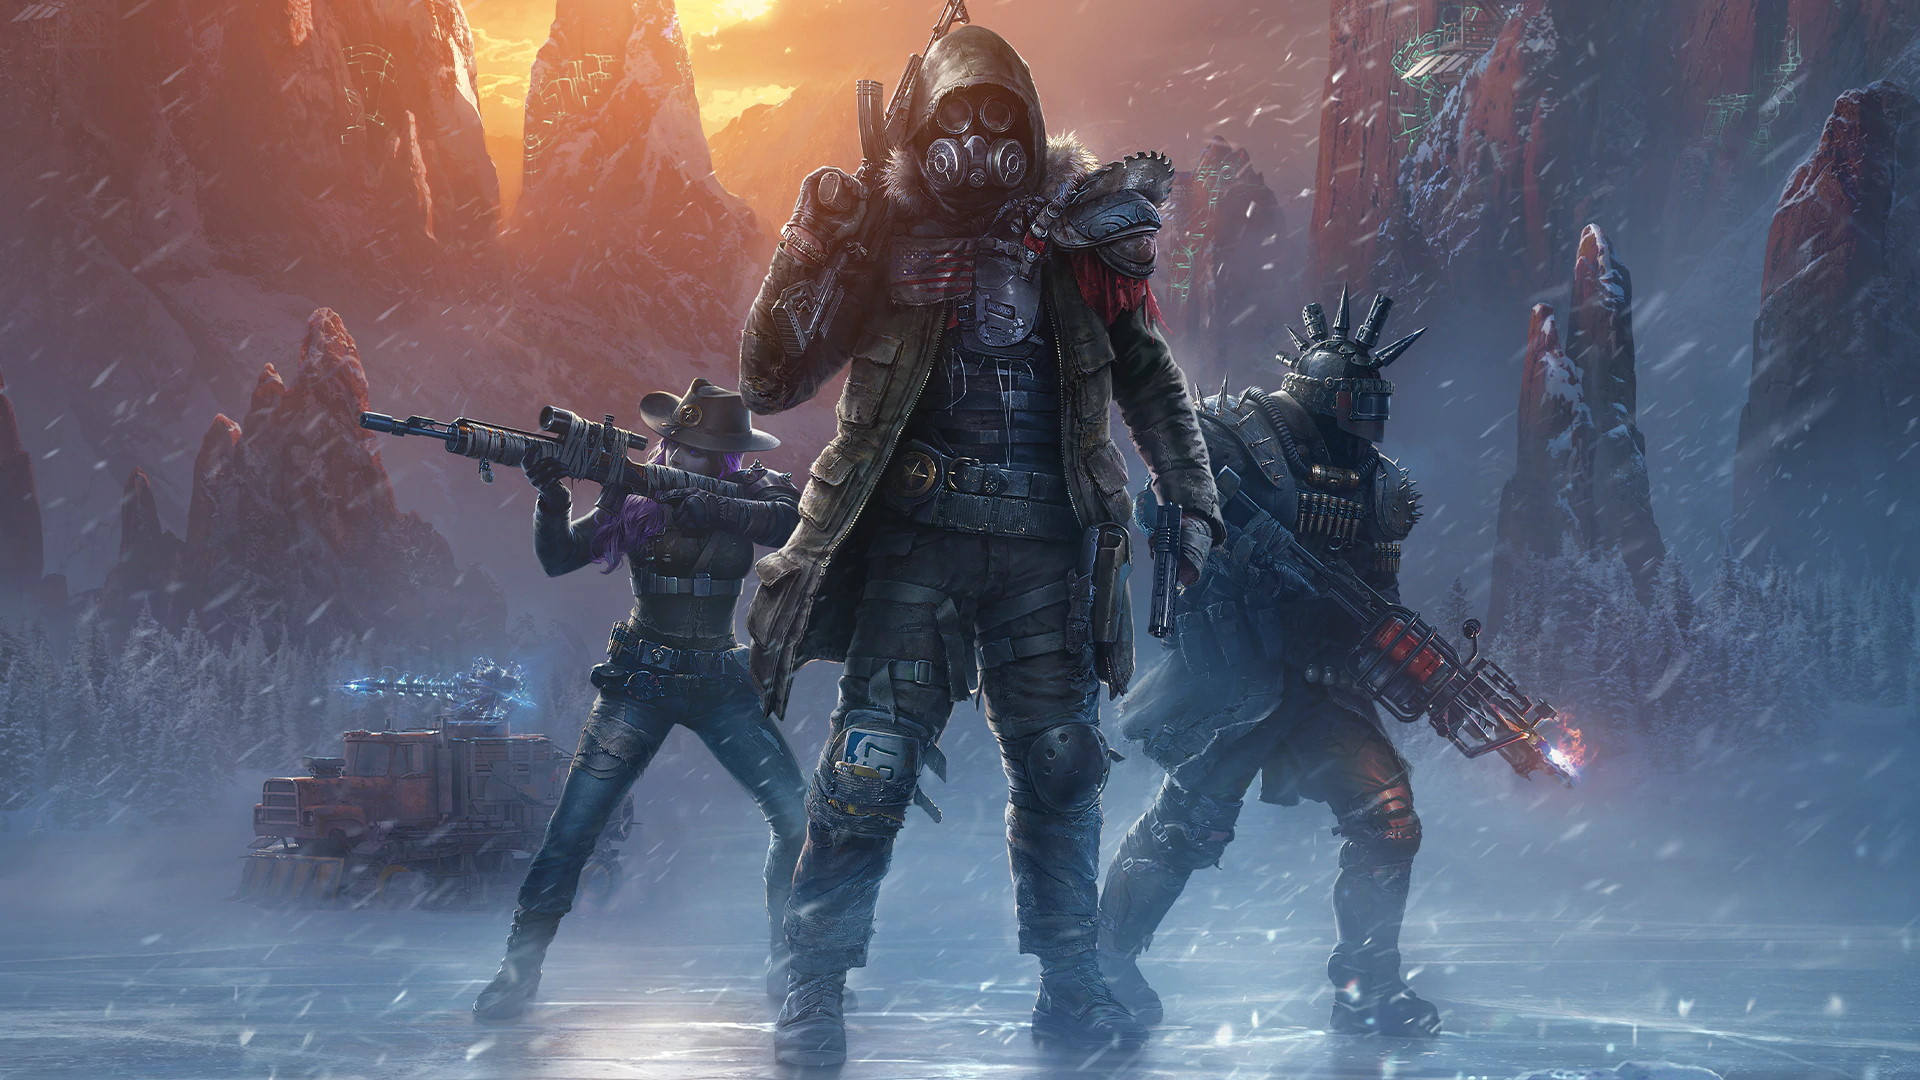 Распродажа в PS Store: Wasteland3, Desperados III, Untitled Goose Game, Fall Guys